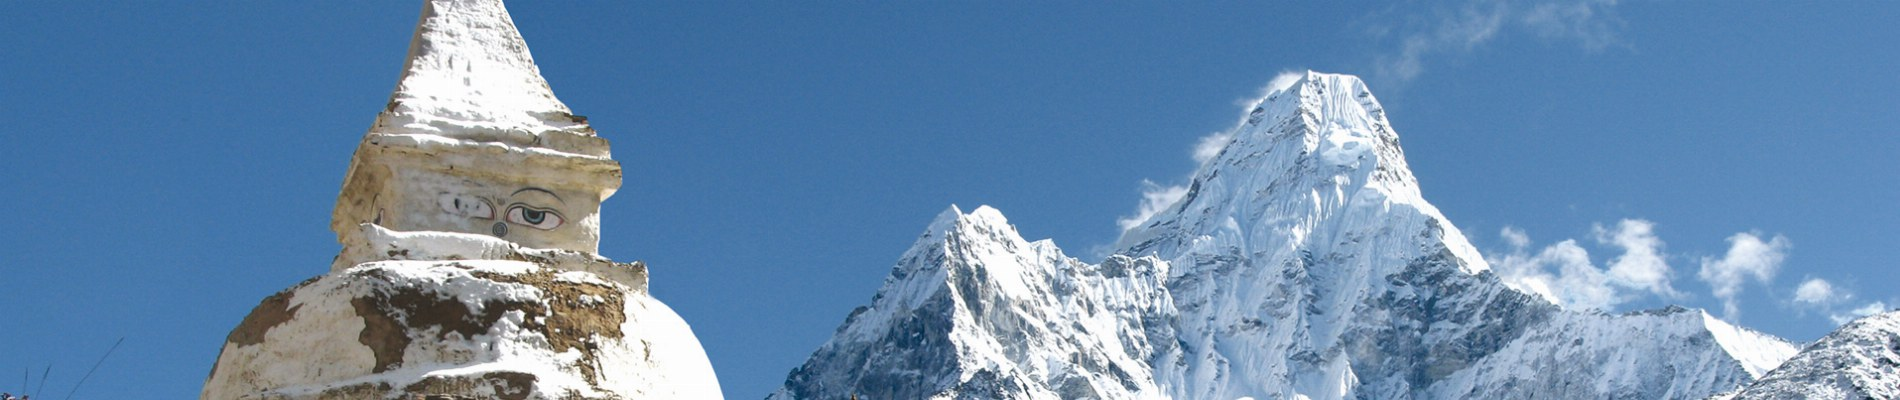 nepal wanderreisen